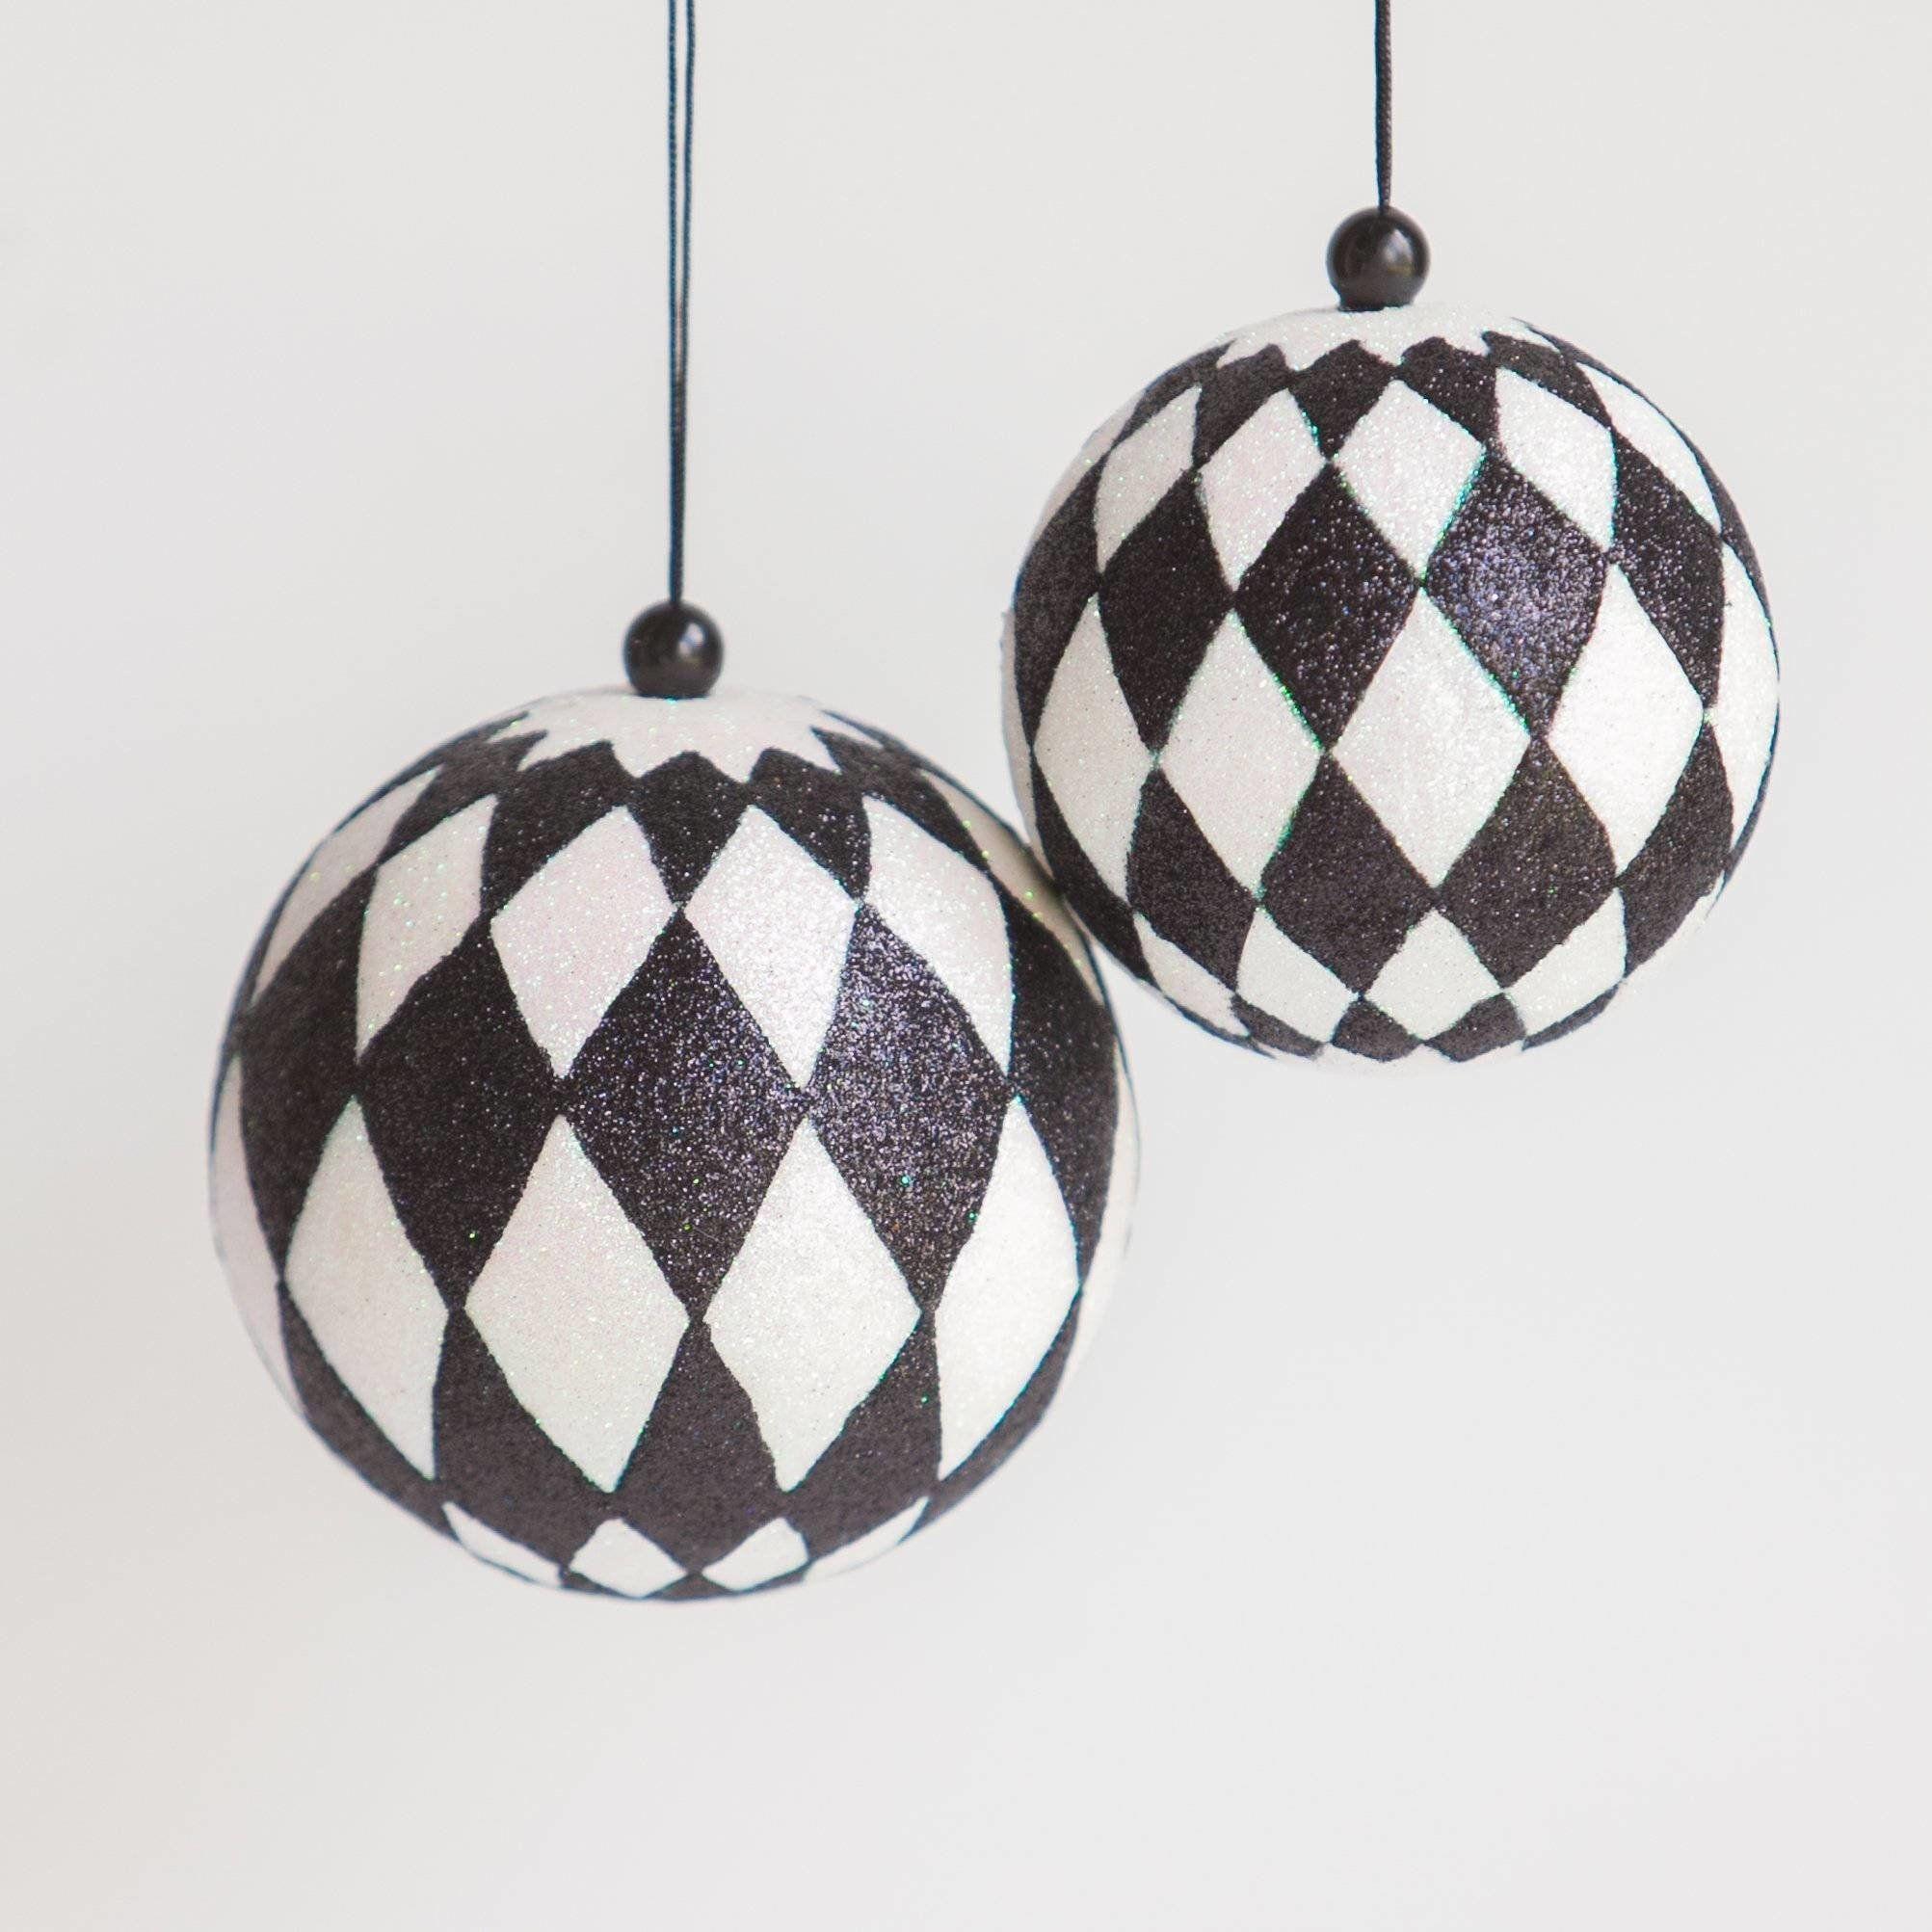 Black And White Diamond Or Checkered Ornament Ball Shatterproof Ornament Ball 5 And 4 White Christmas Ornaments Black Christmas Trees Black White Christmas